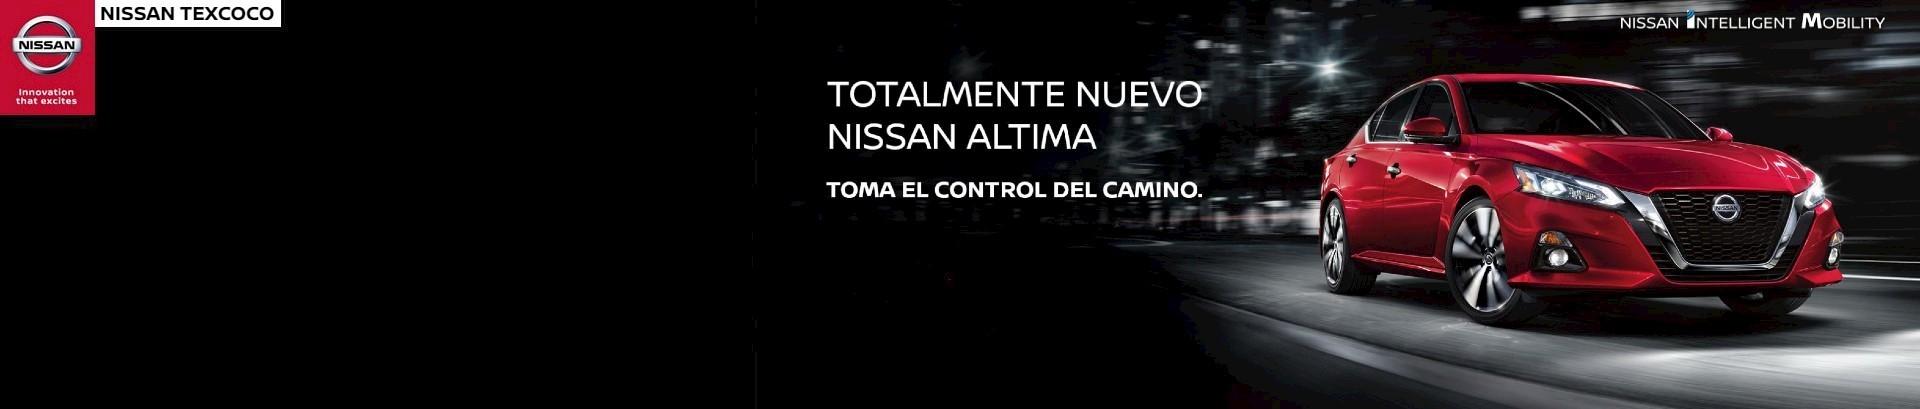 Nissan Texcoco